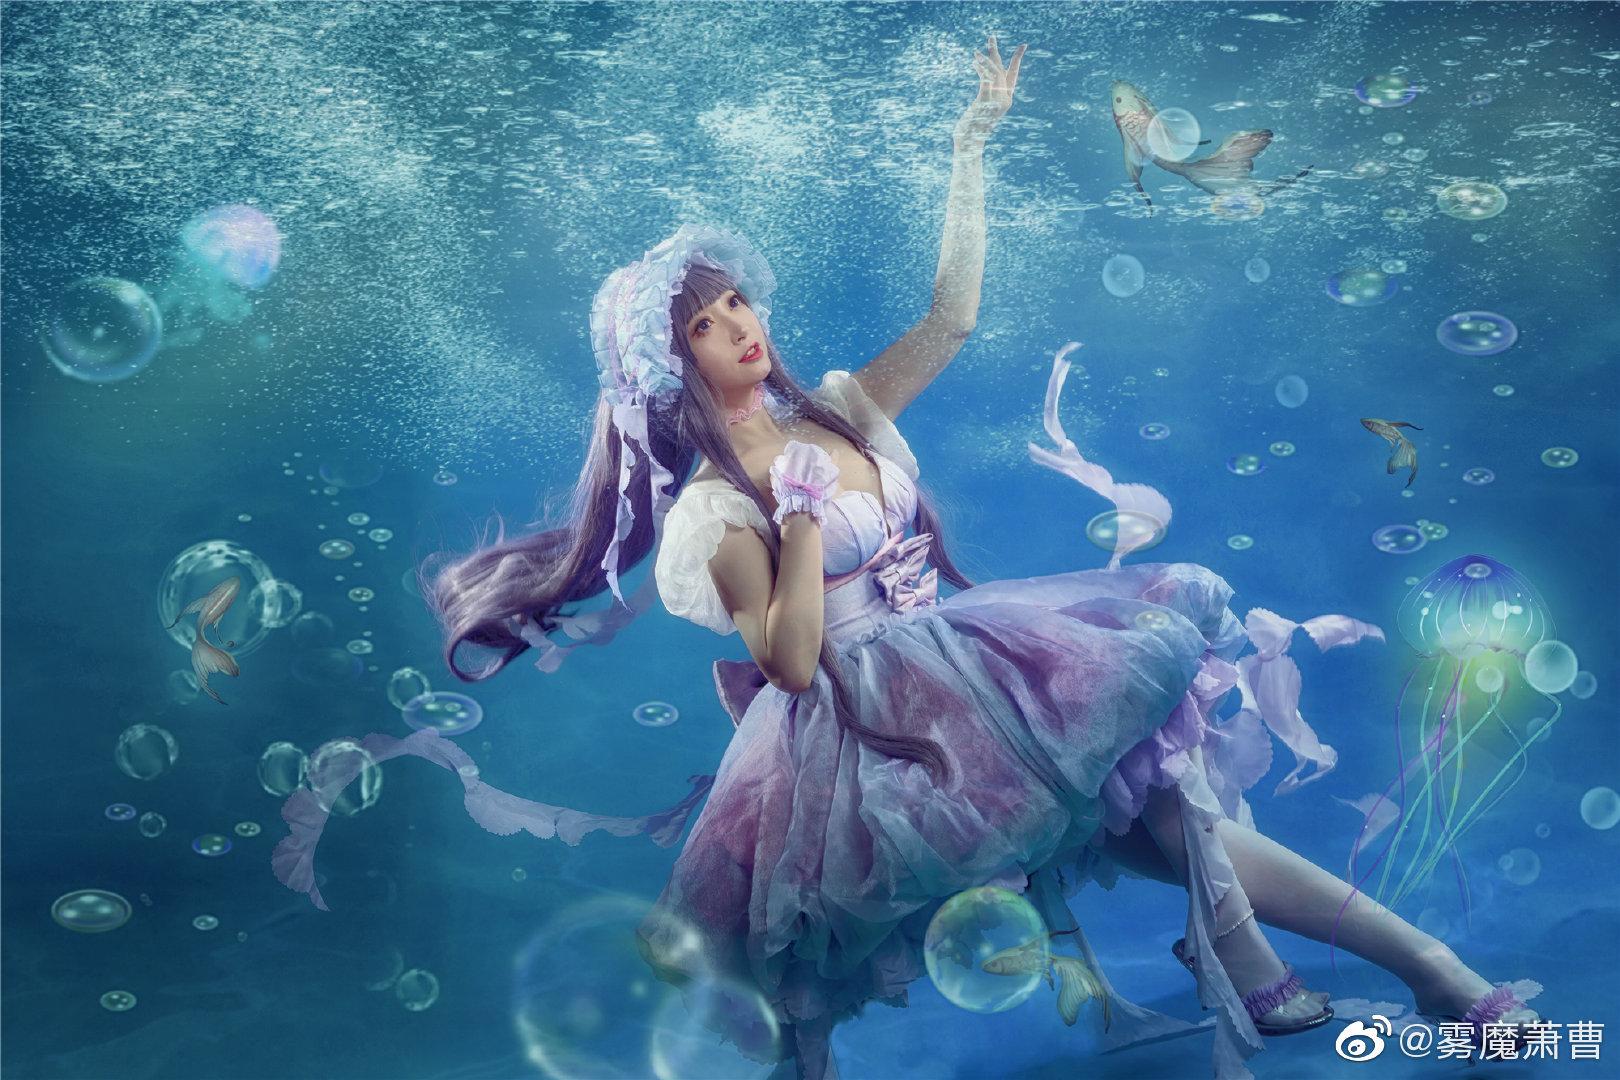 [COS]#魔卡少女樱# 大道寺知世 - 水之轮舞曲 COSPLAY-第11张